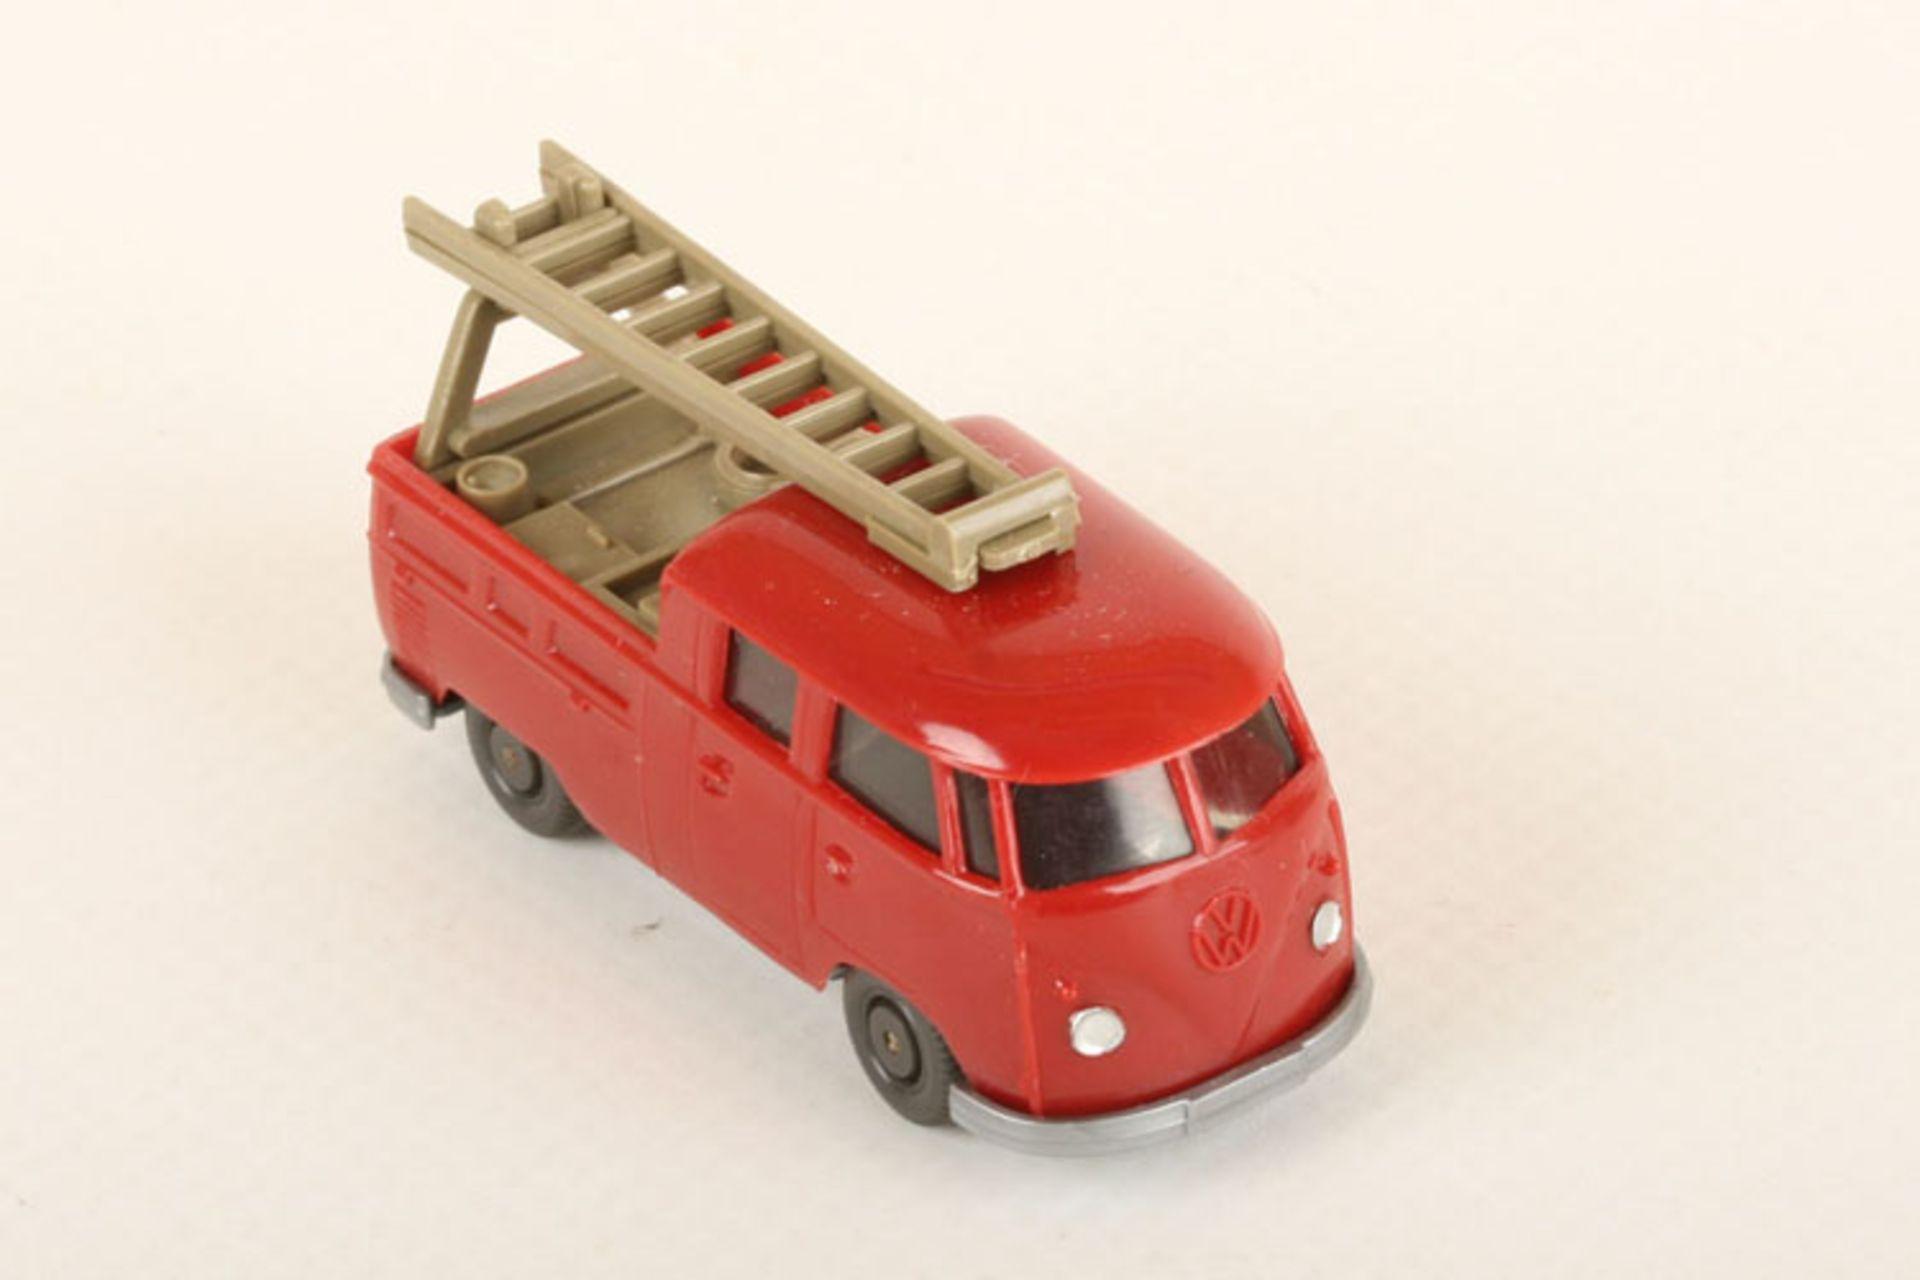 Los 1054 - Wiking VW Montagewagen h'braunrot 296/1c, Steg bb, neuwertig